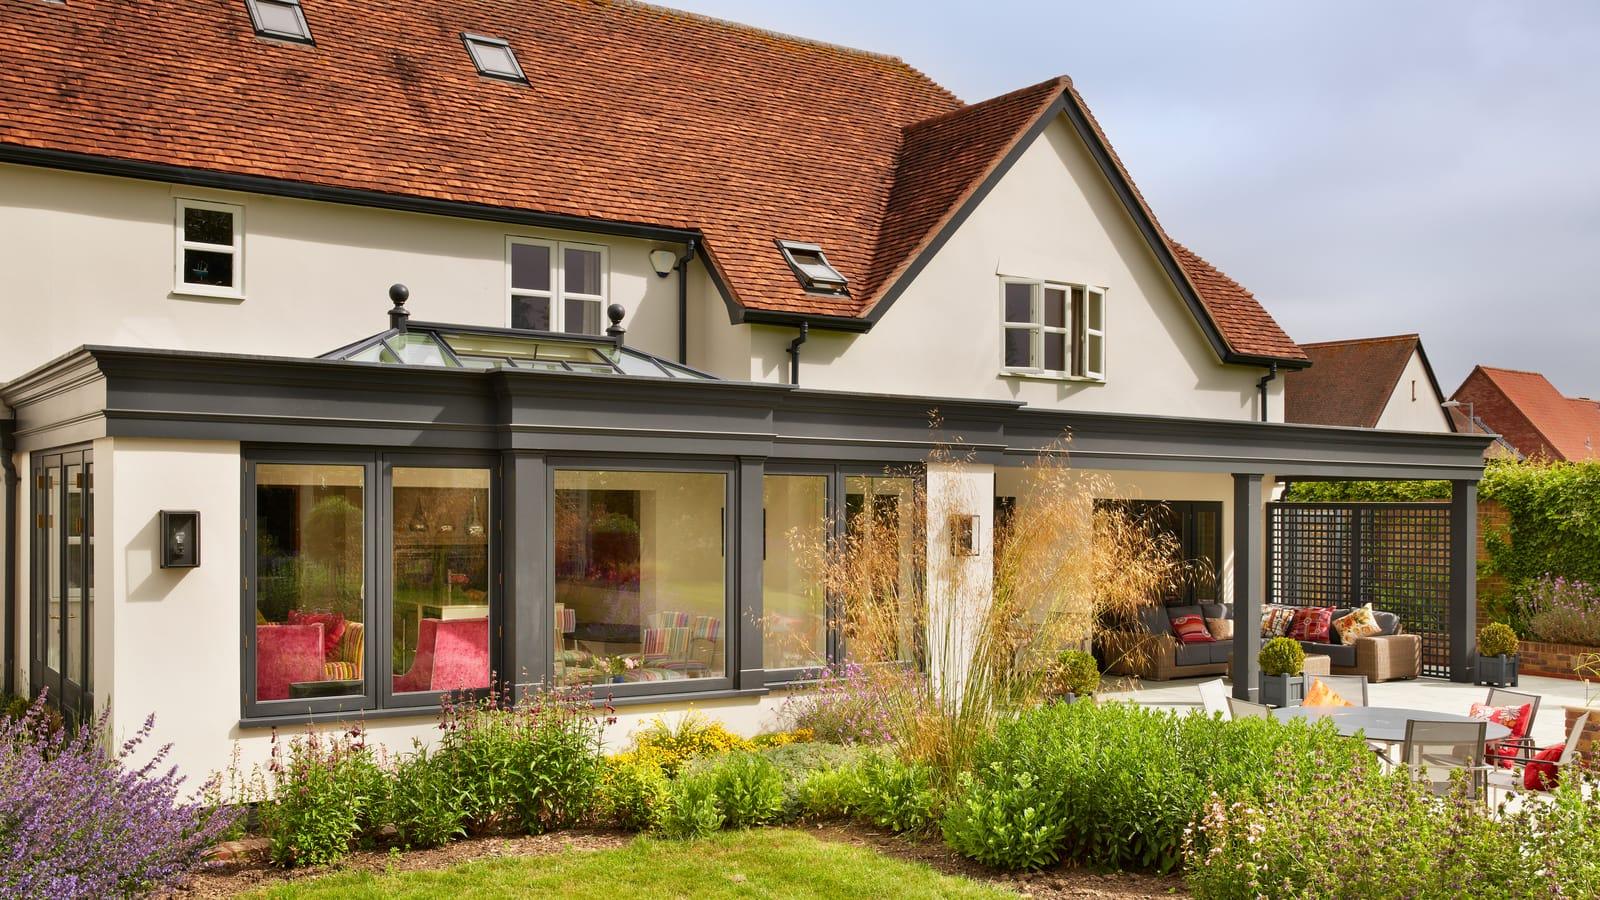 Exterior of stunning Westbury Black Orangery